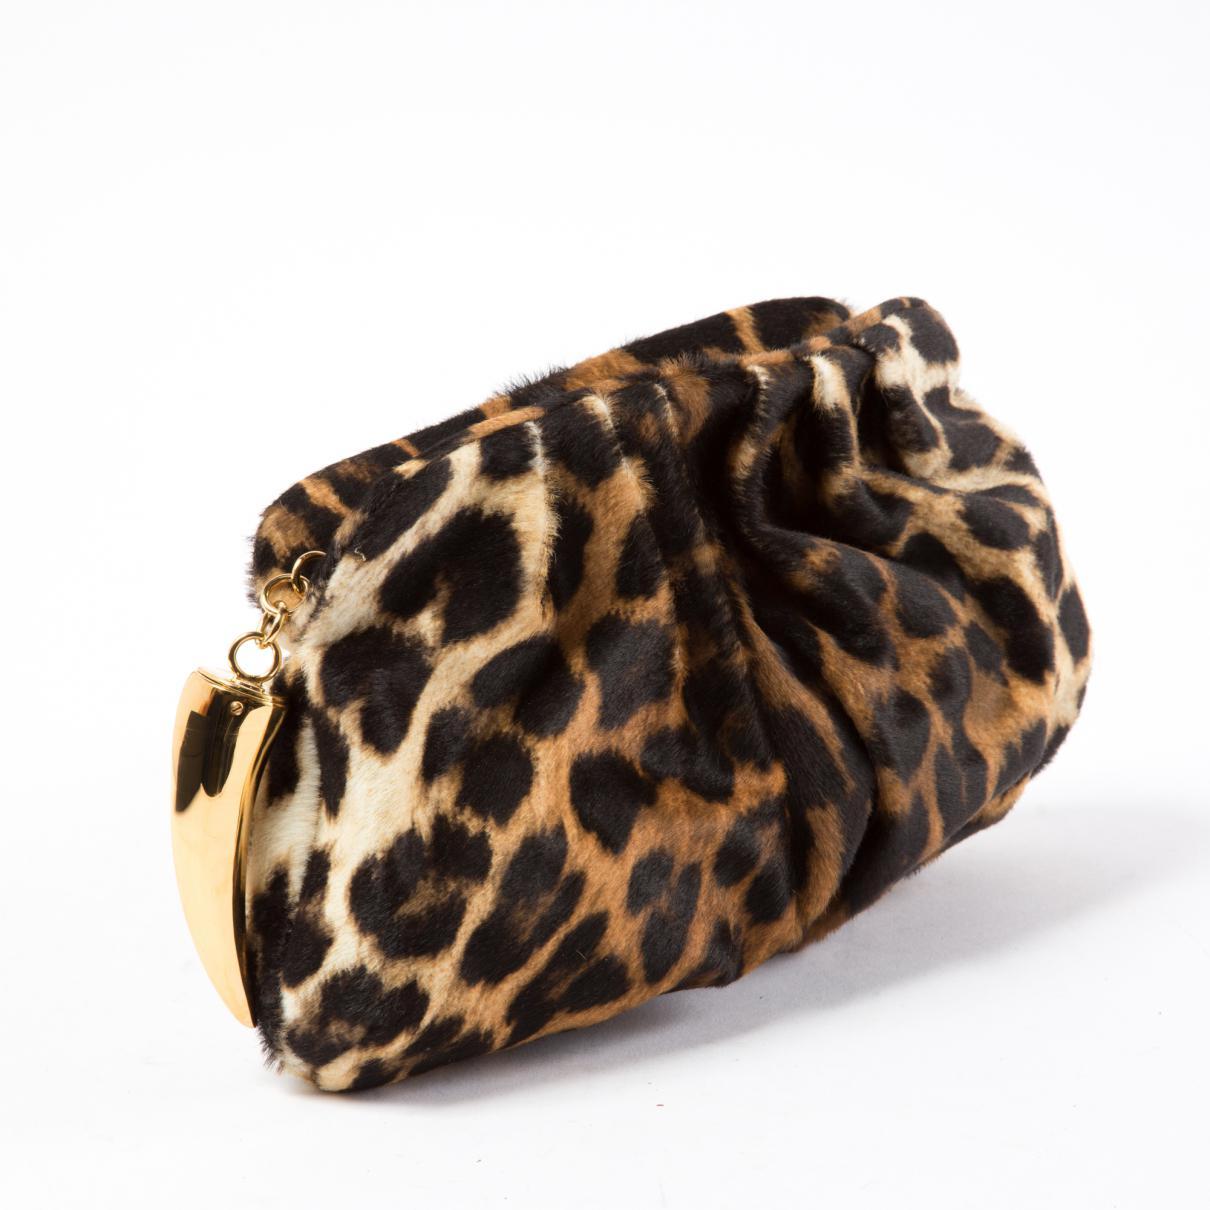 Giuseppe Zanotti Pre-owned - Ponyhair-style calfskin clutch bag L6PDhyaj